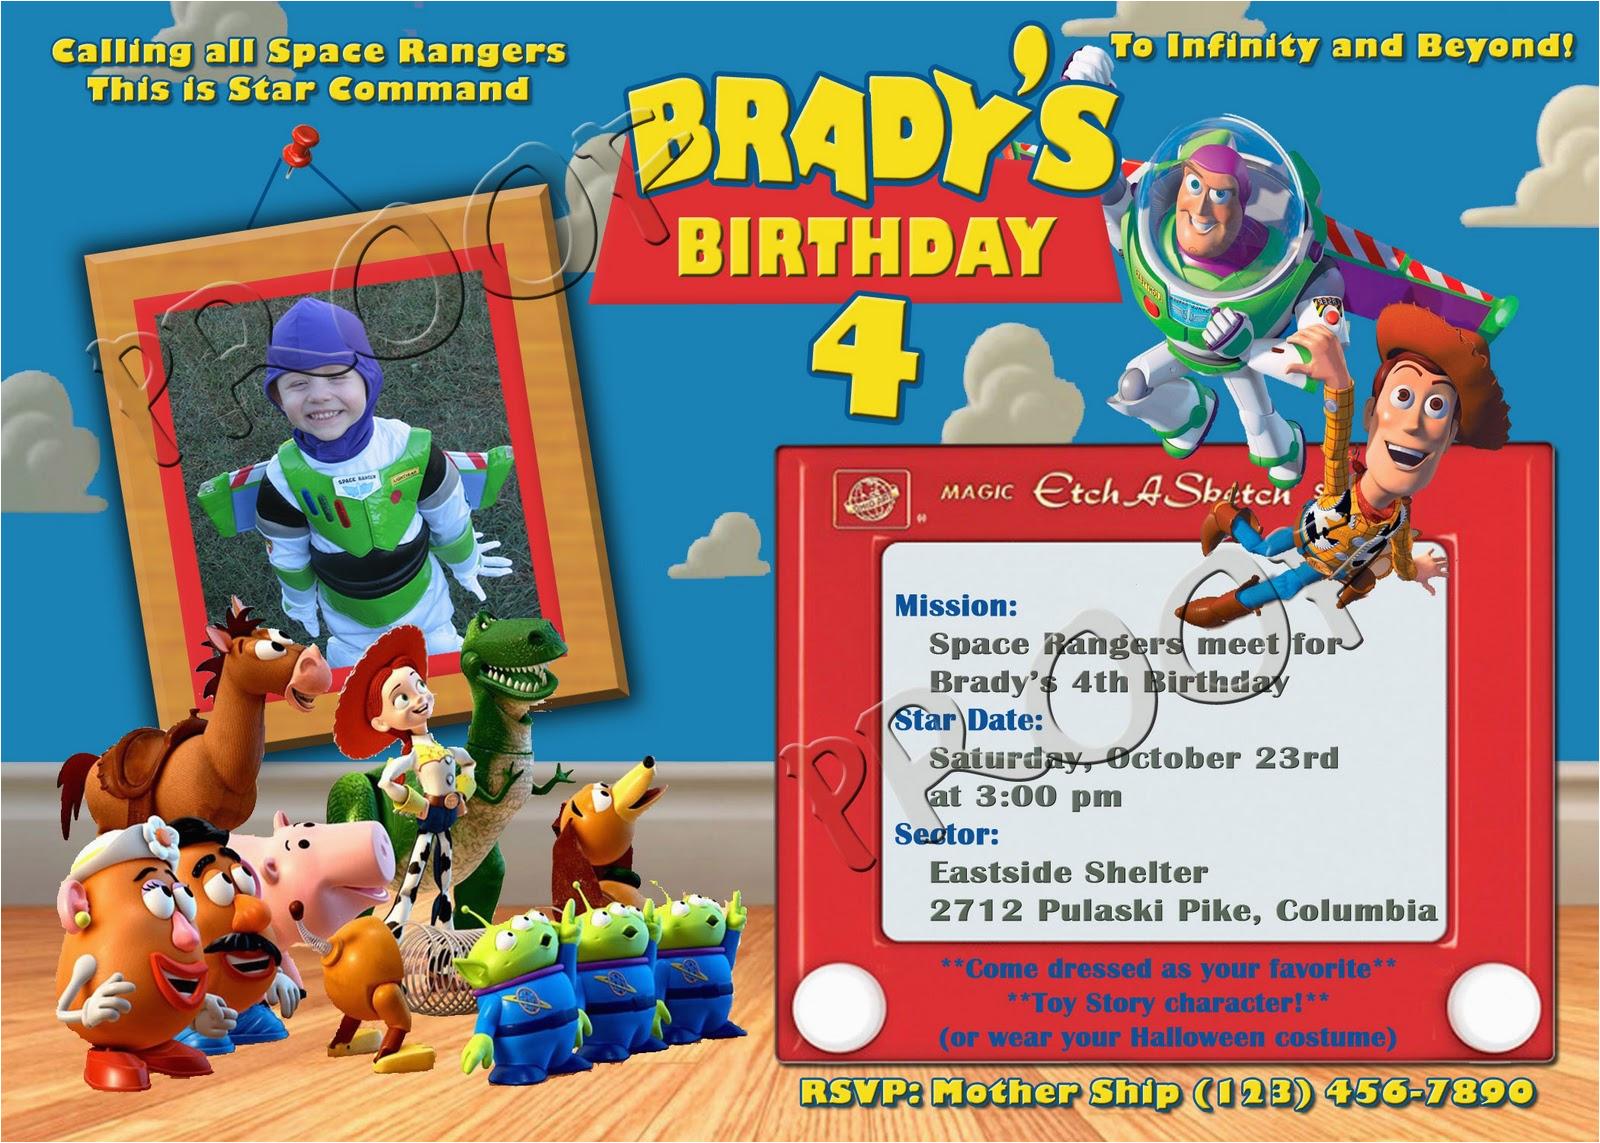 Personalized Toy Story Birthday Invitations | Birthdaybuzz - Free Printable Toy Story 3 Birthday Invitations